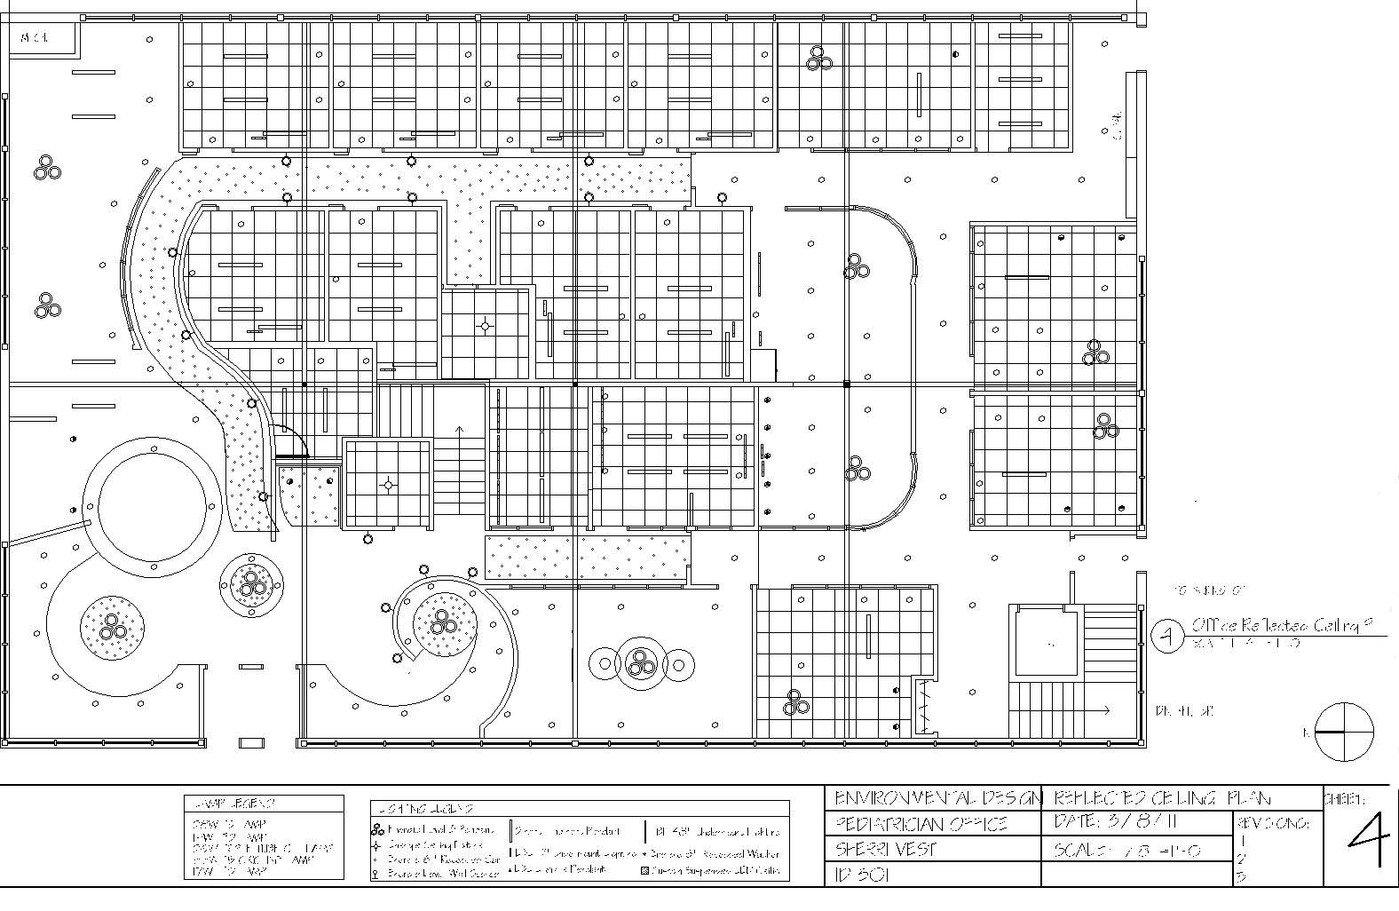 Pediatric Office Floor Plan By Sherri Vest At Coroflot